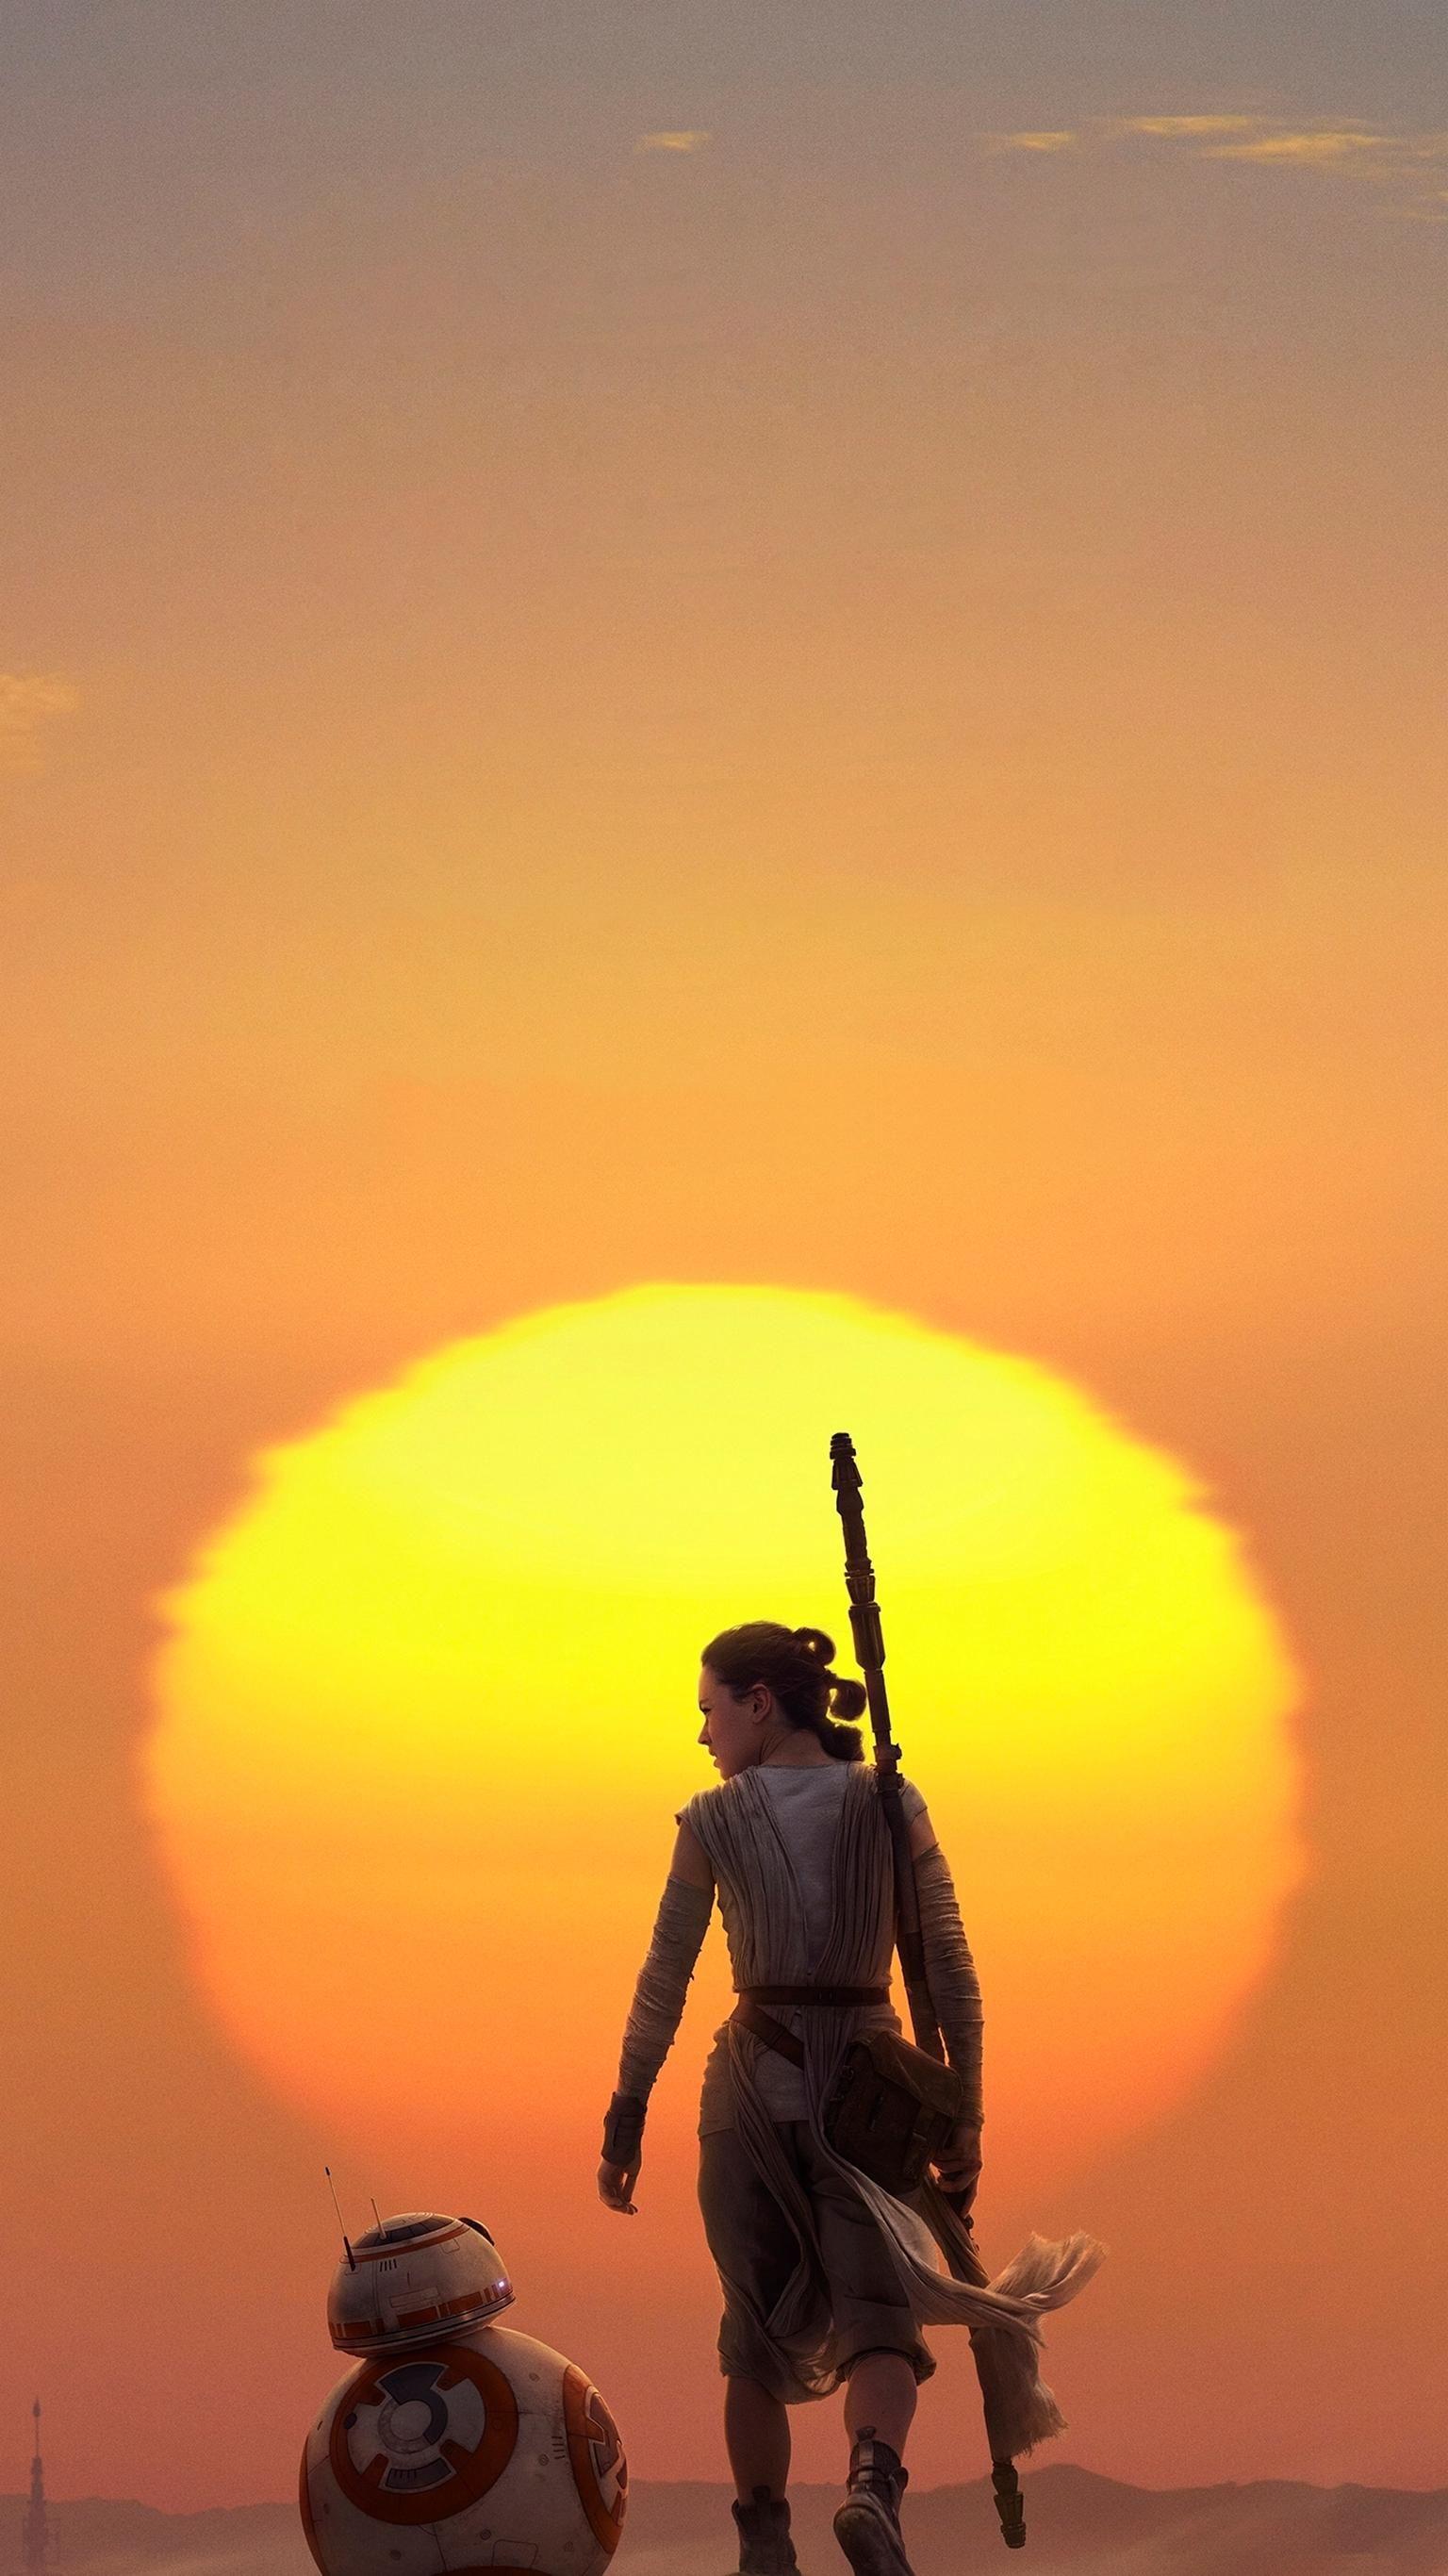 Star Wars: The Force Awakens (2015) Phone Wallpaper